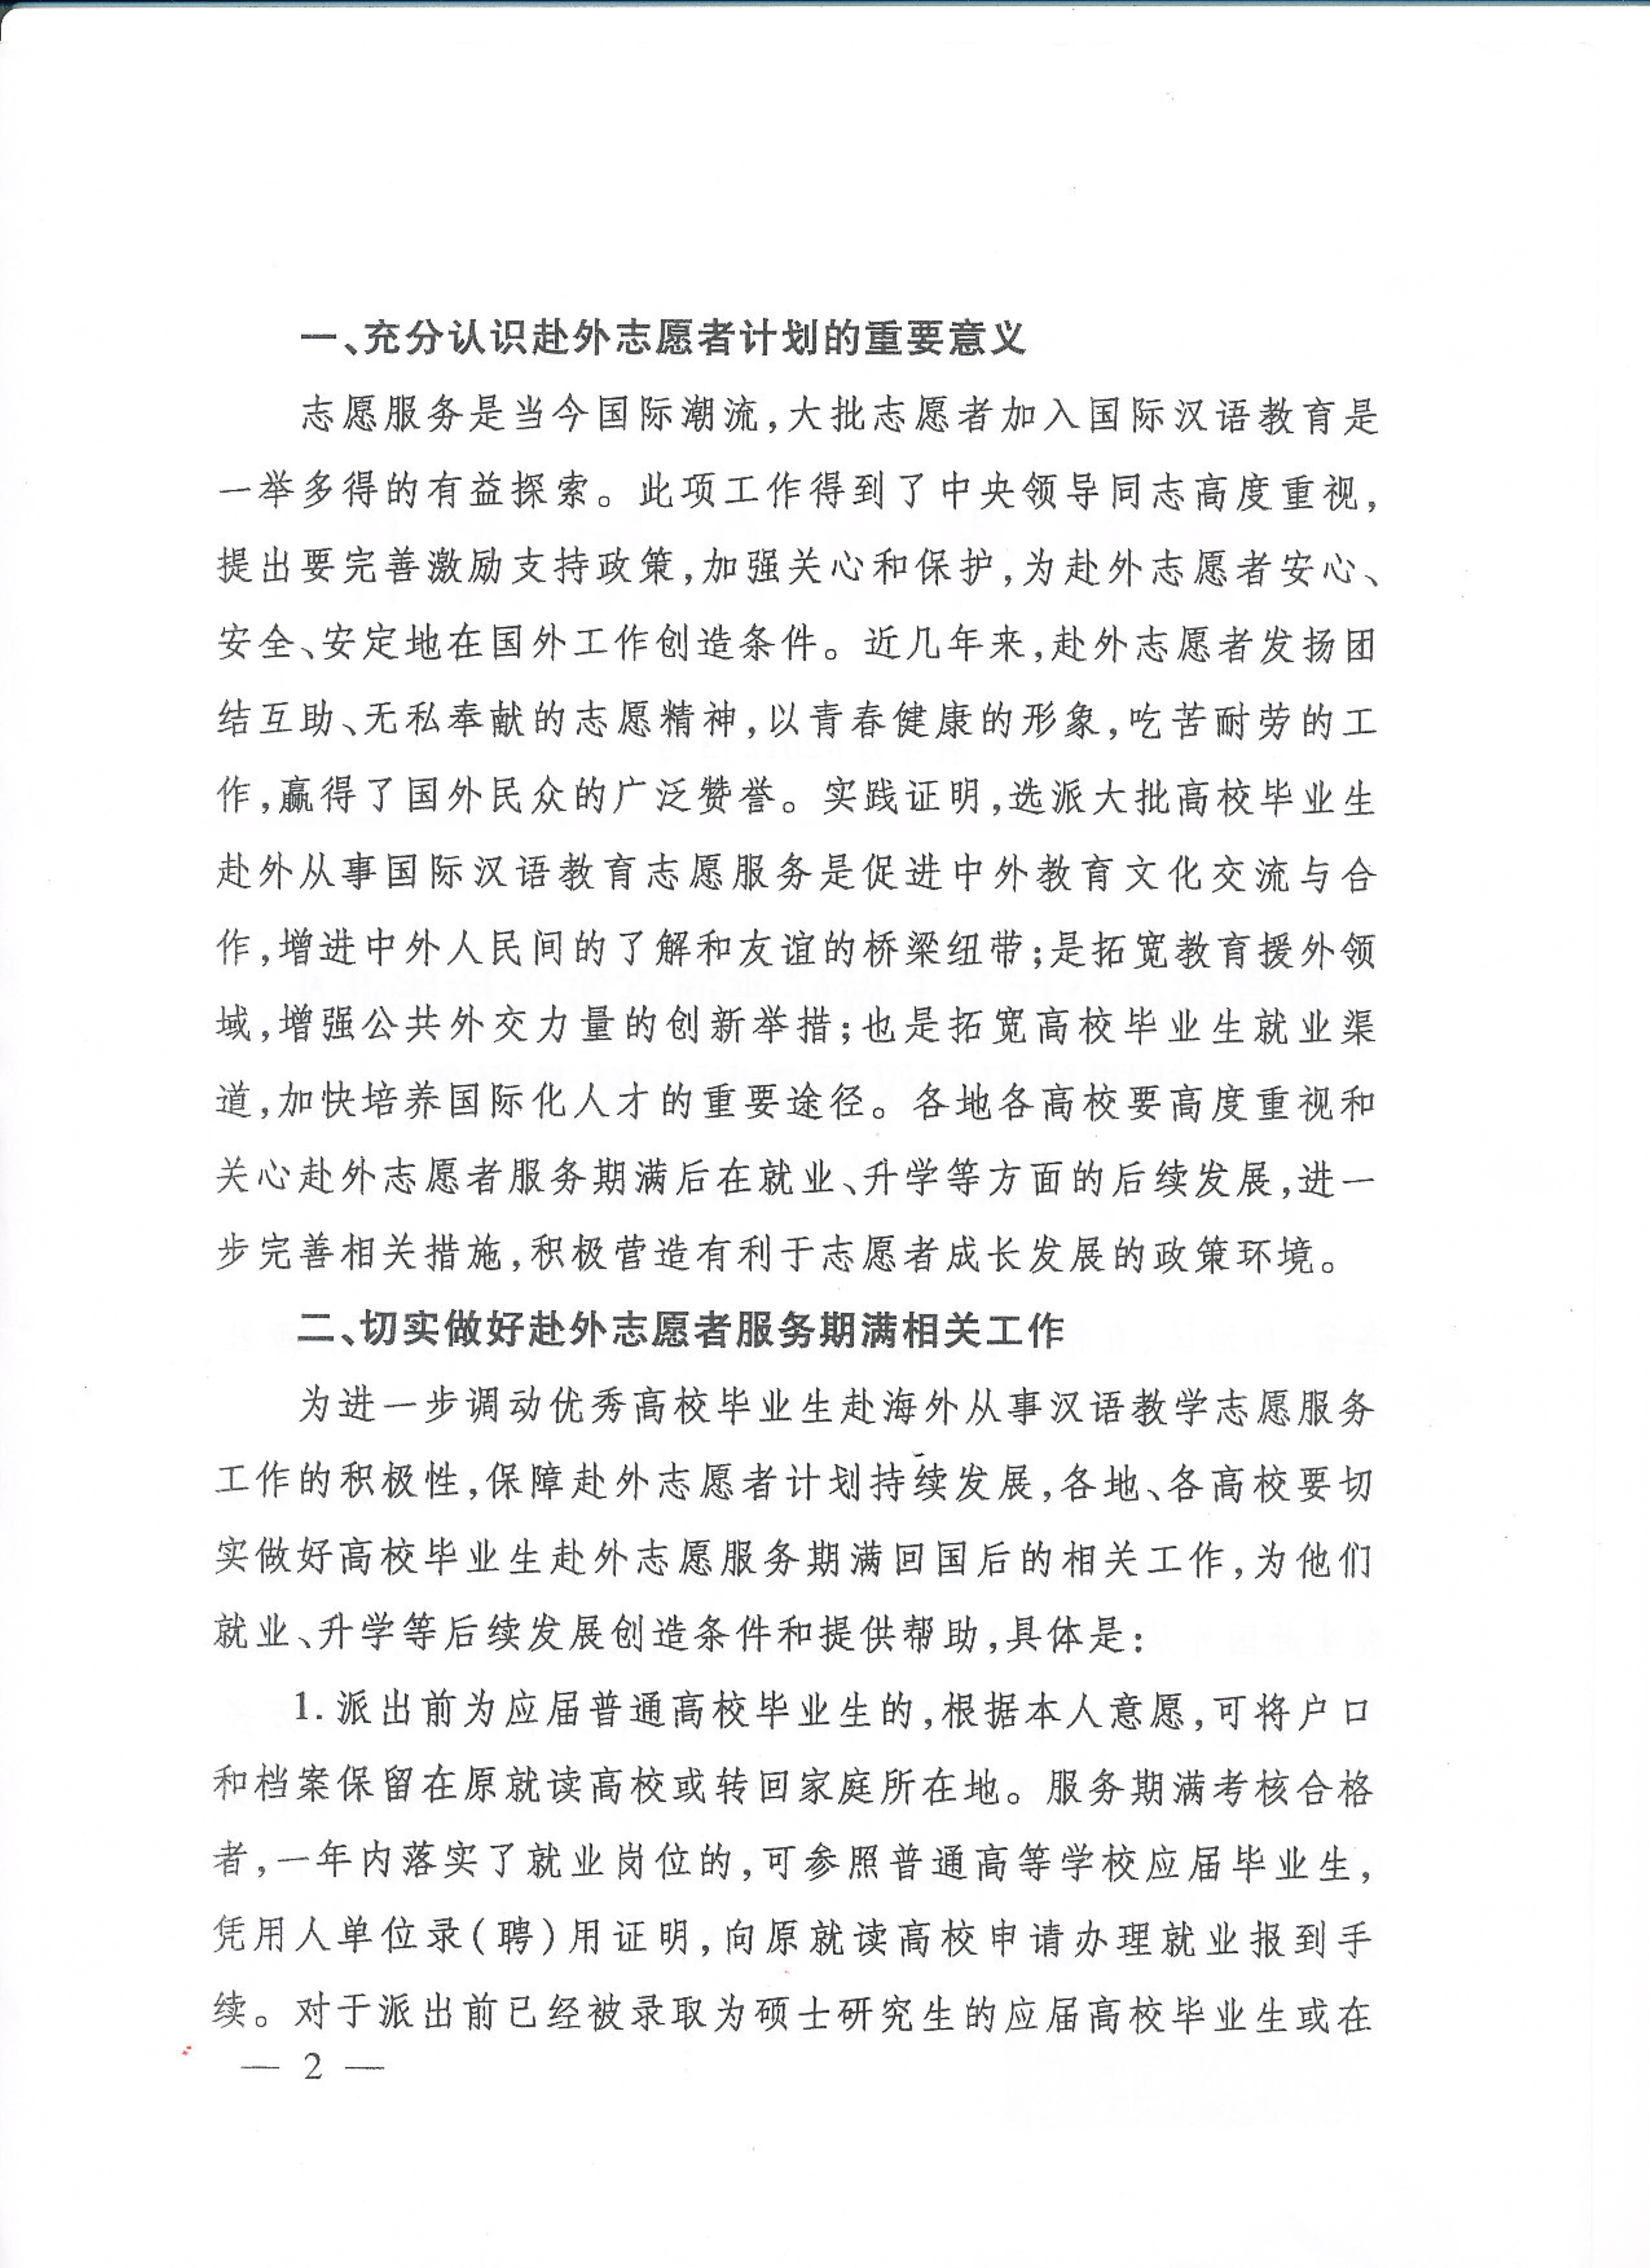 122511325769_0jiaoxueting2012sanhao_2